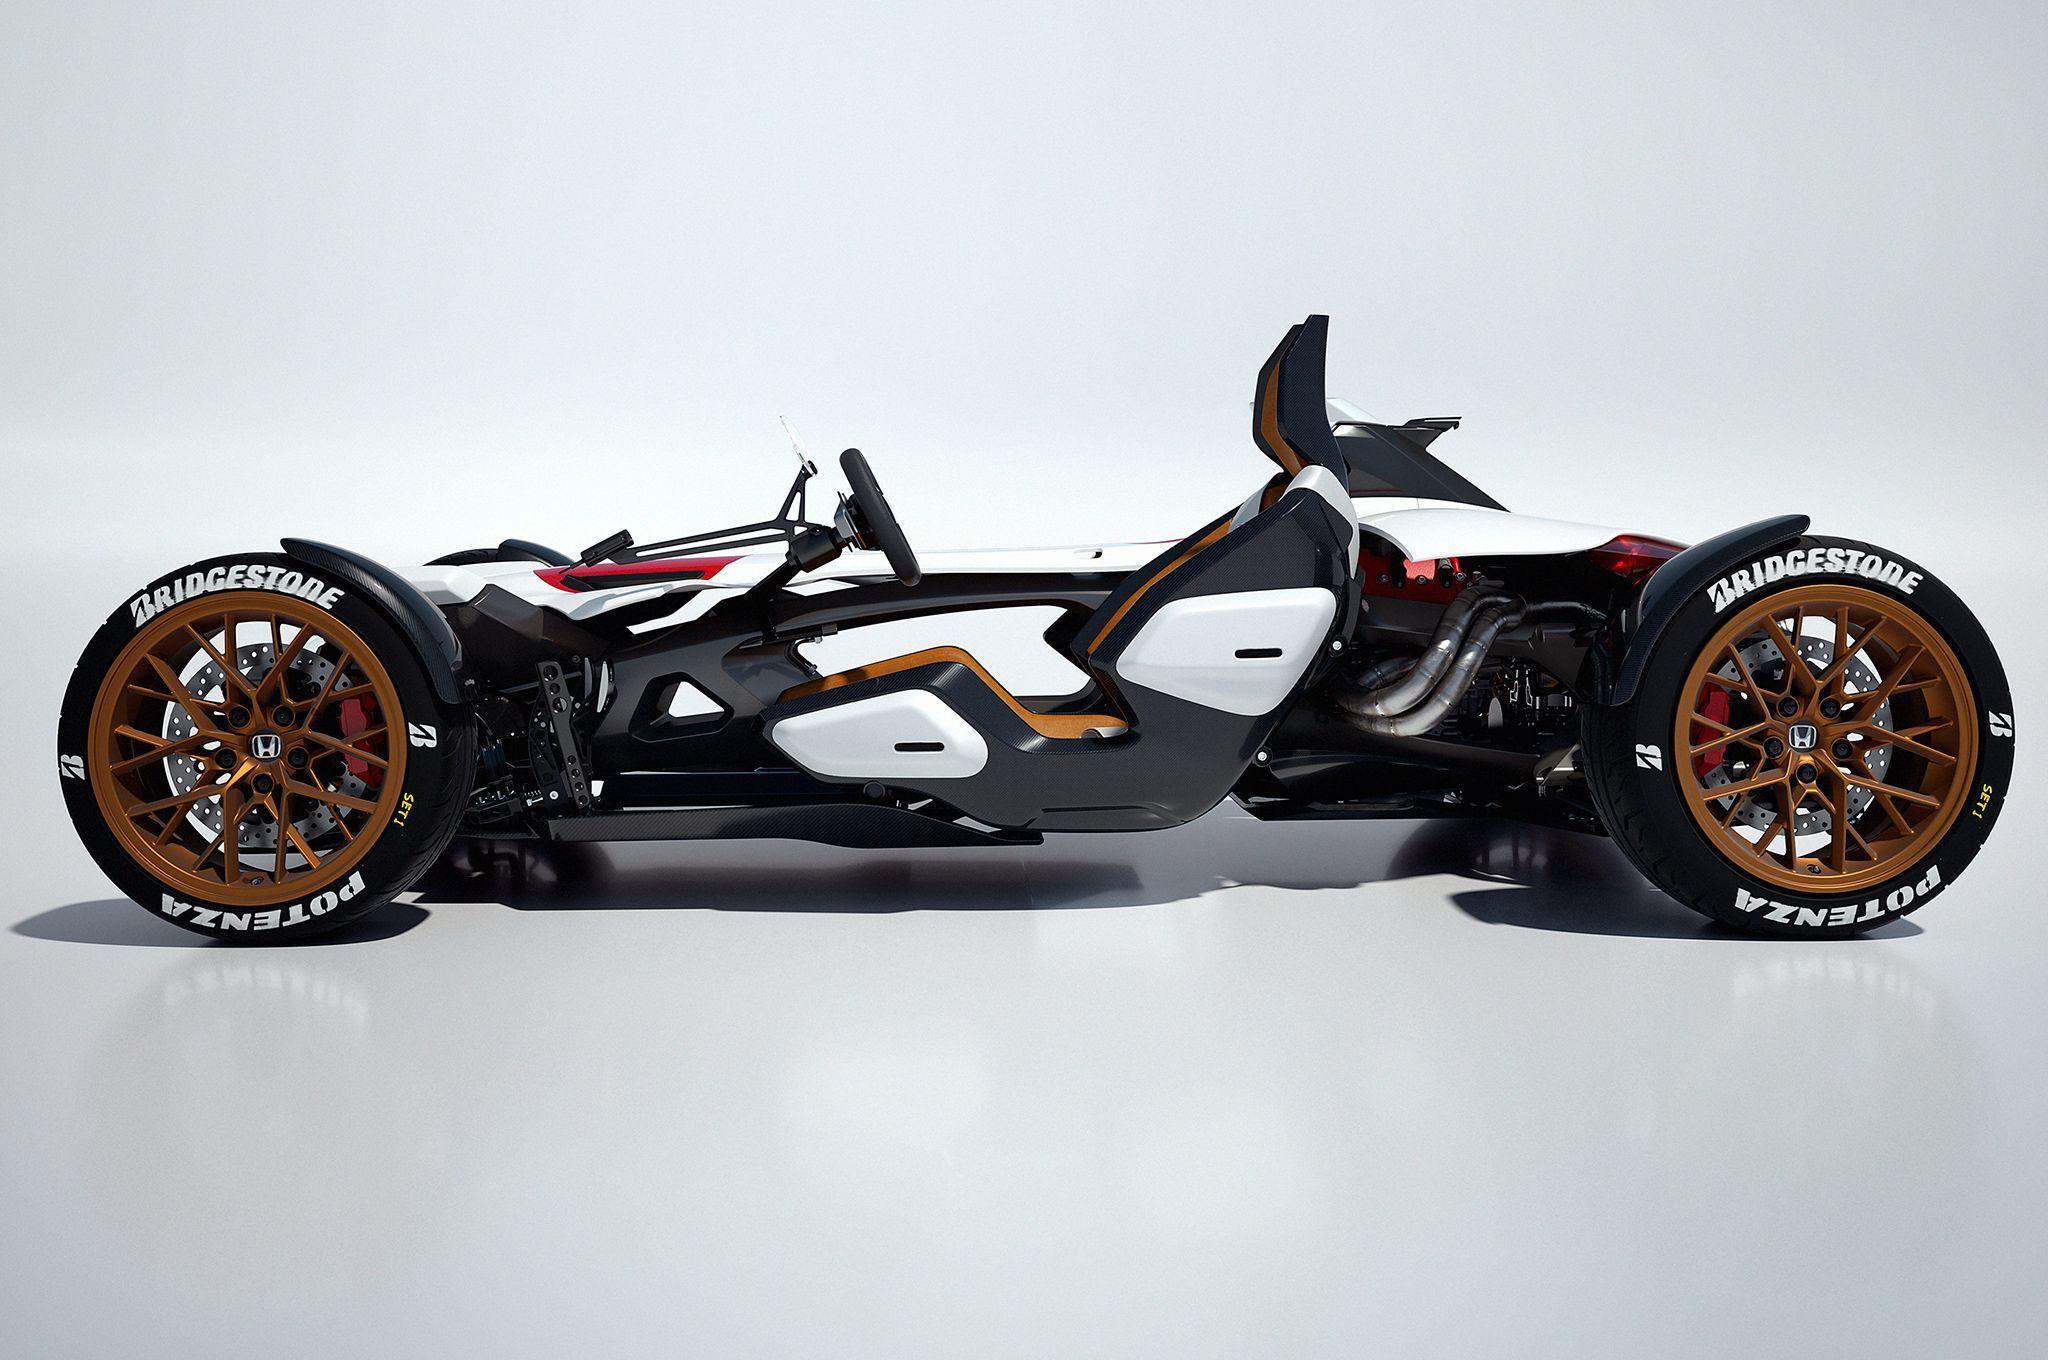 Honda Project 2 4 Automobile Shows Side View Motorbike Design